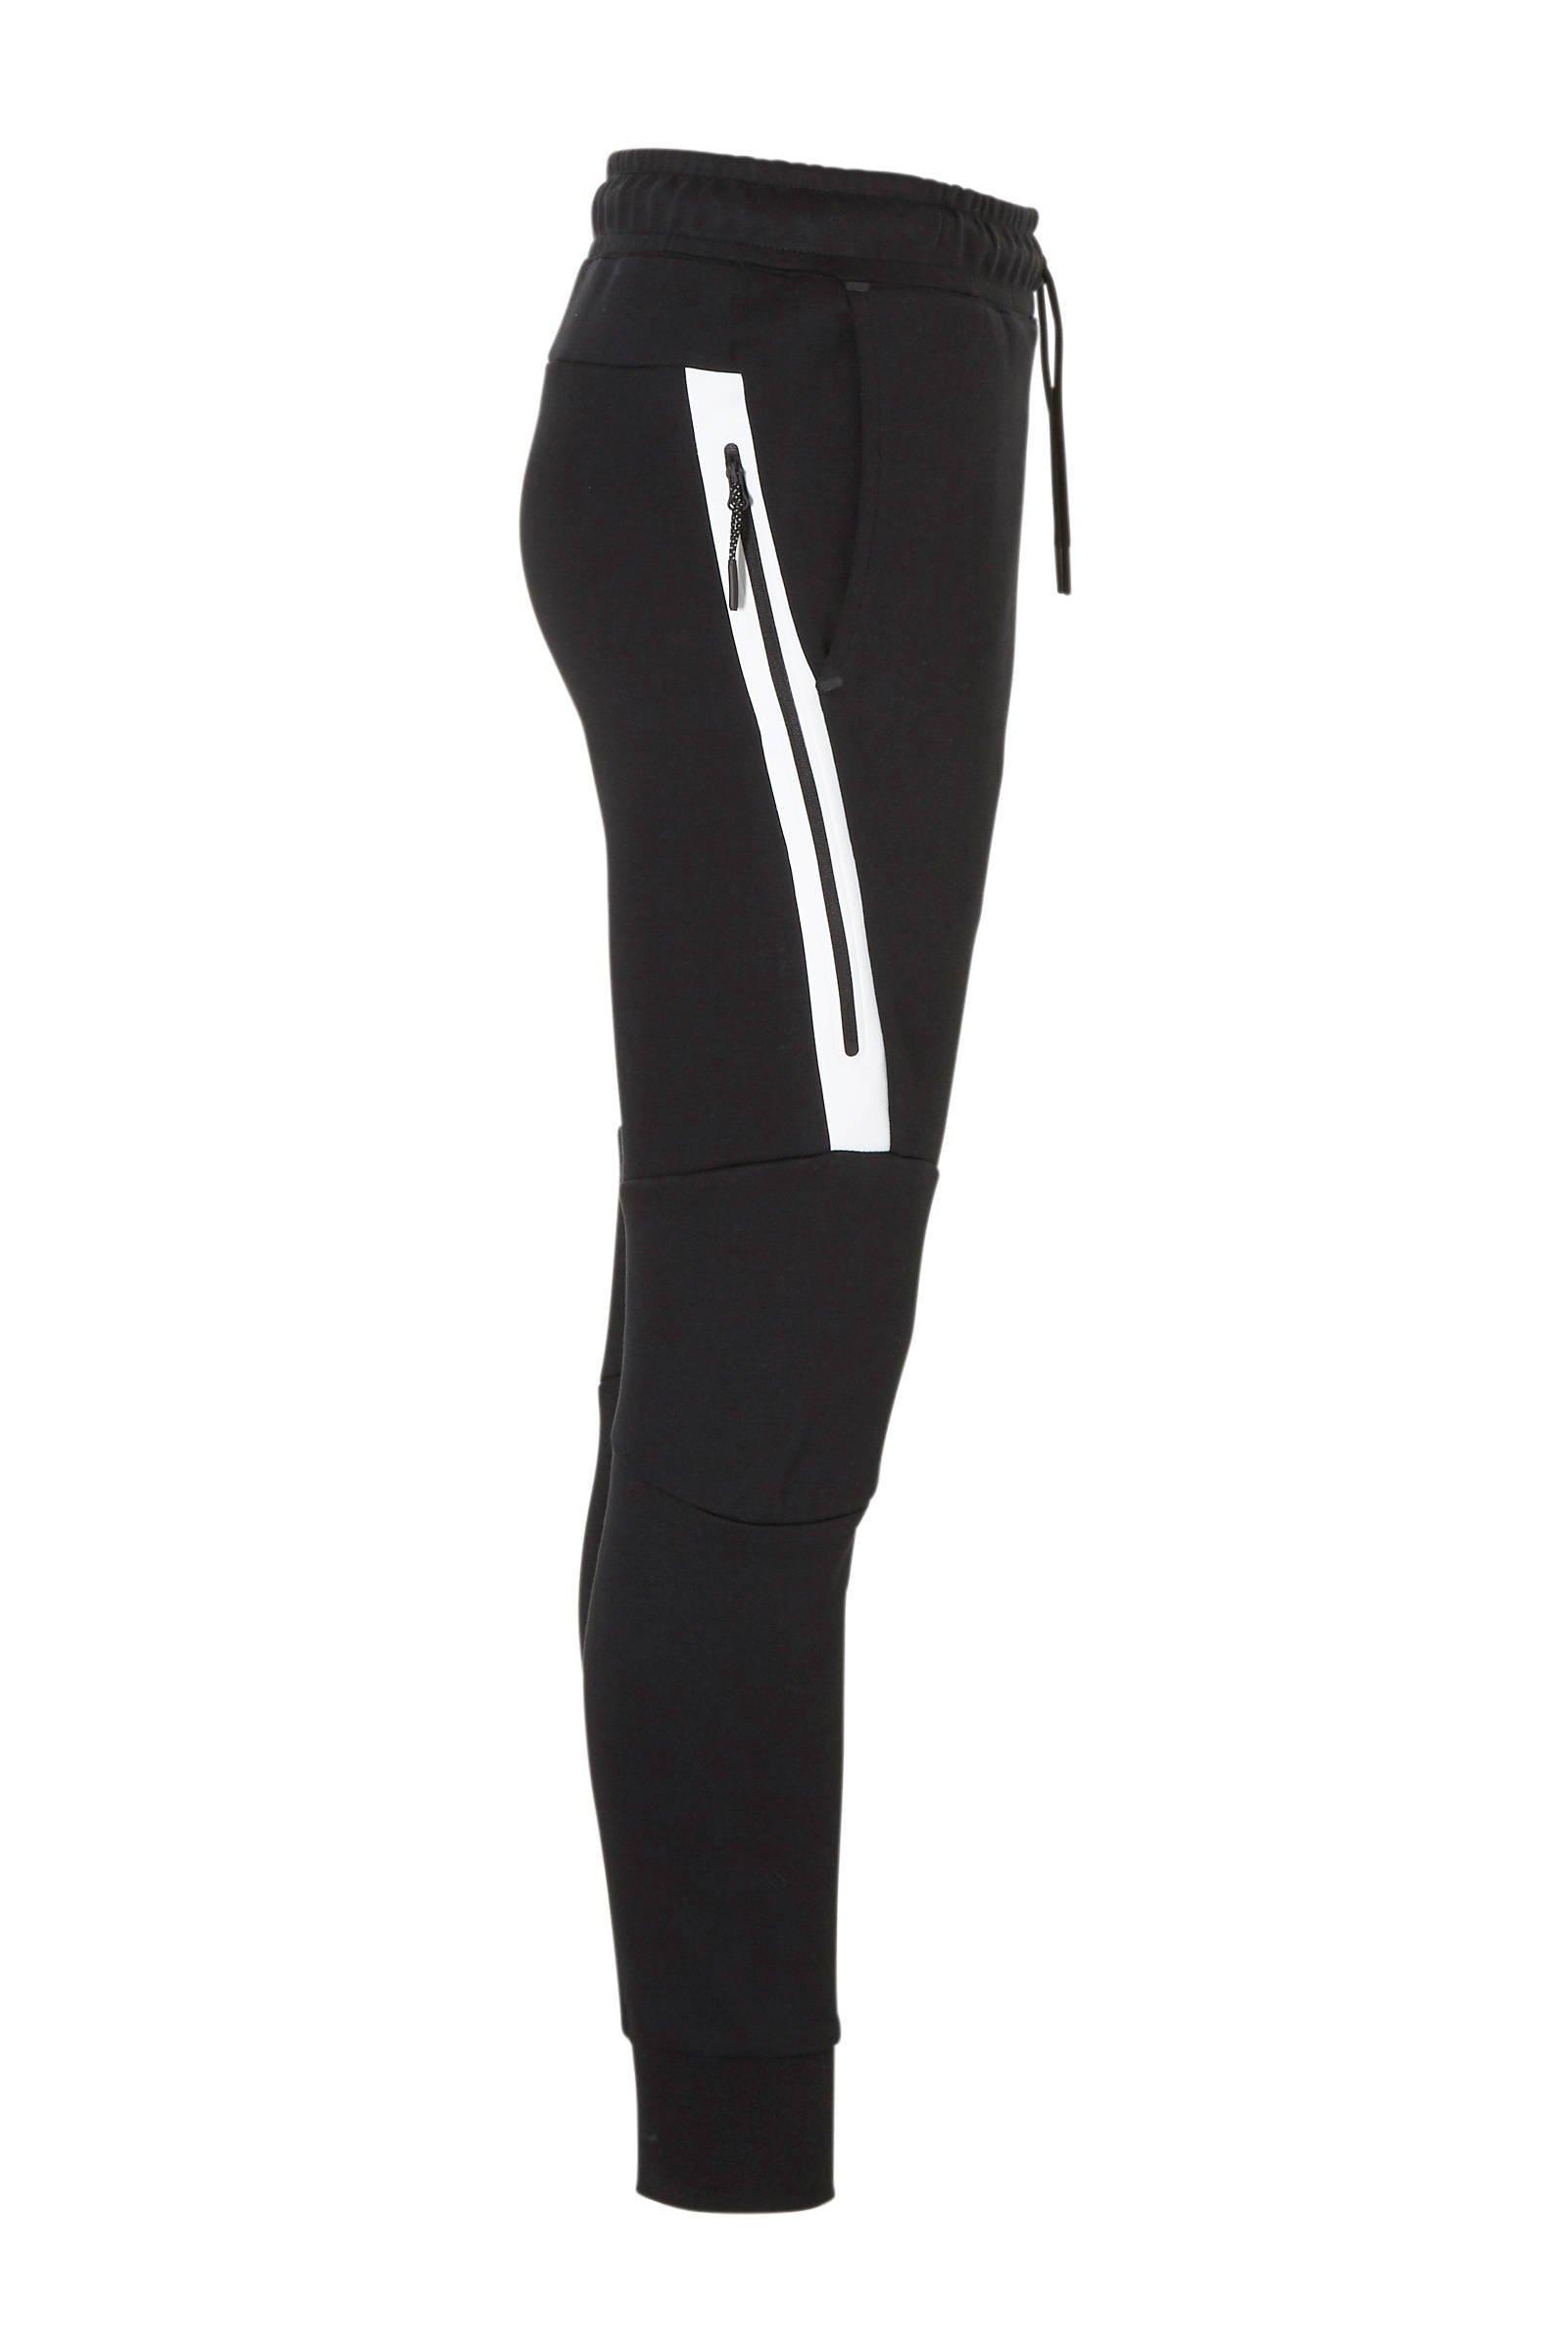 Nike Tech Fleece joggingbroek | wehkamp